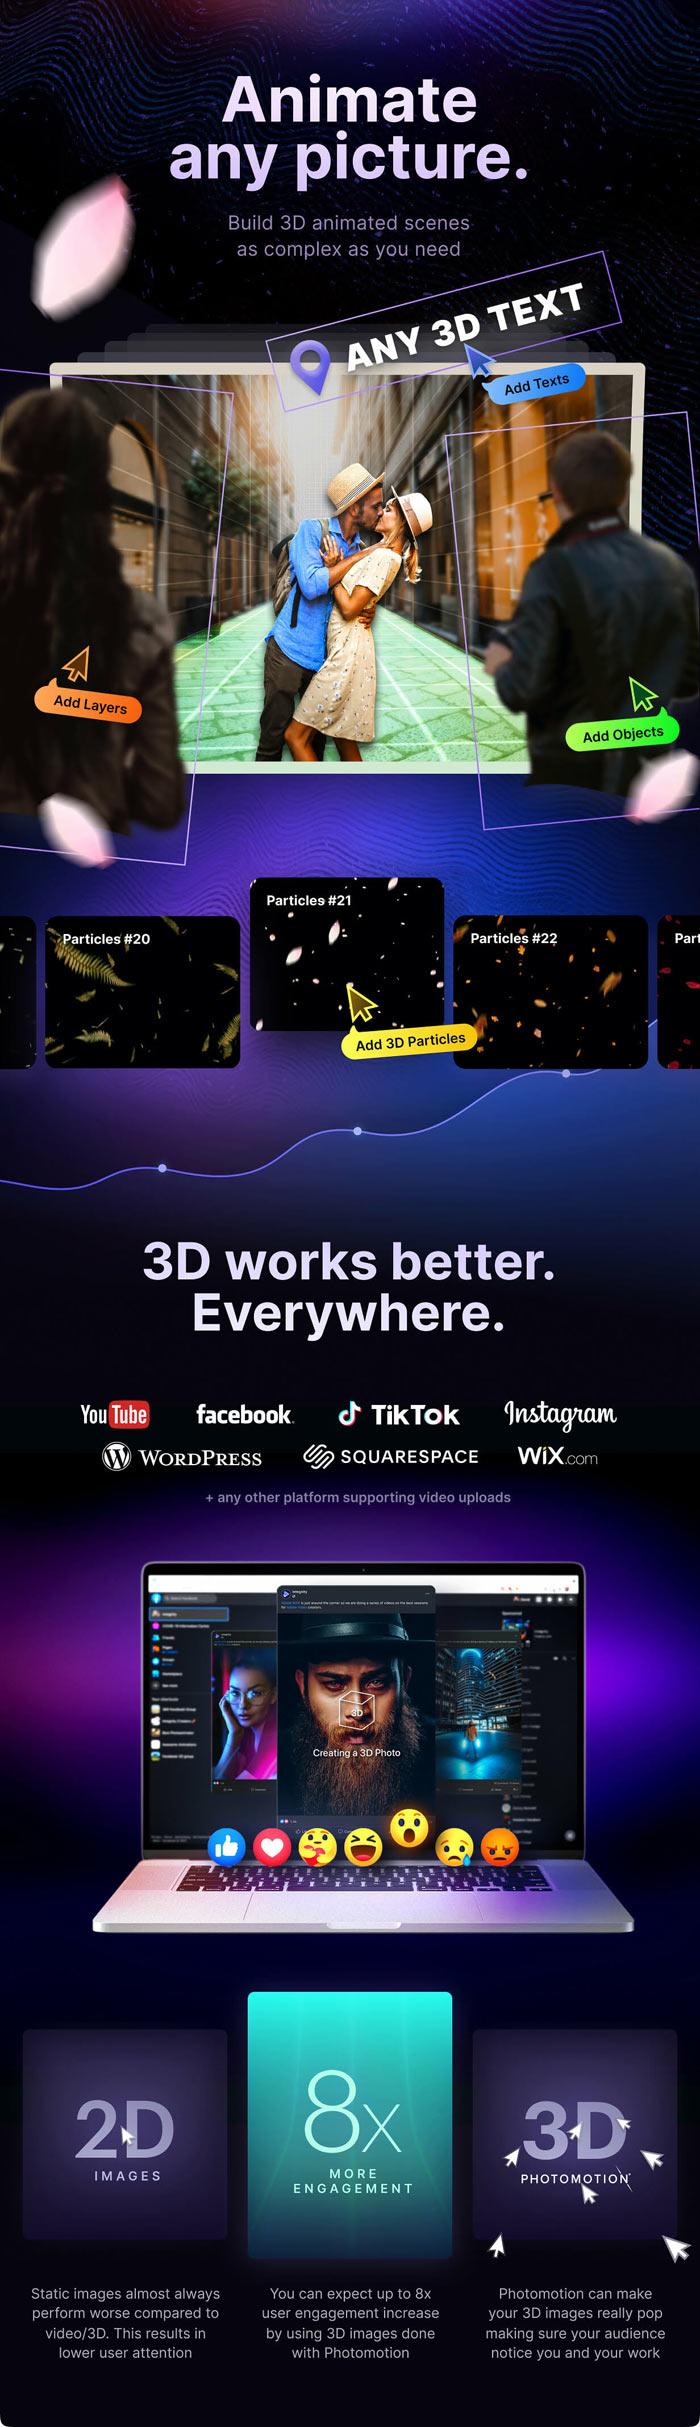 Photomotion 3D Photo Animator 6 in 1